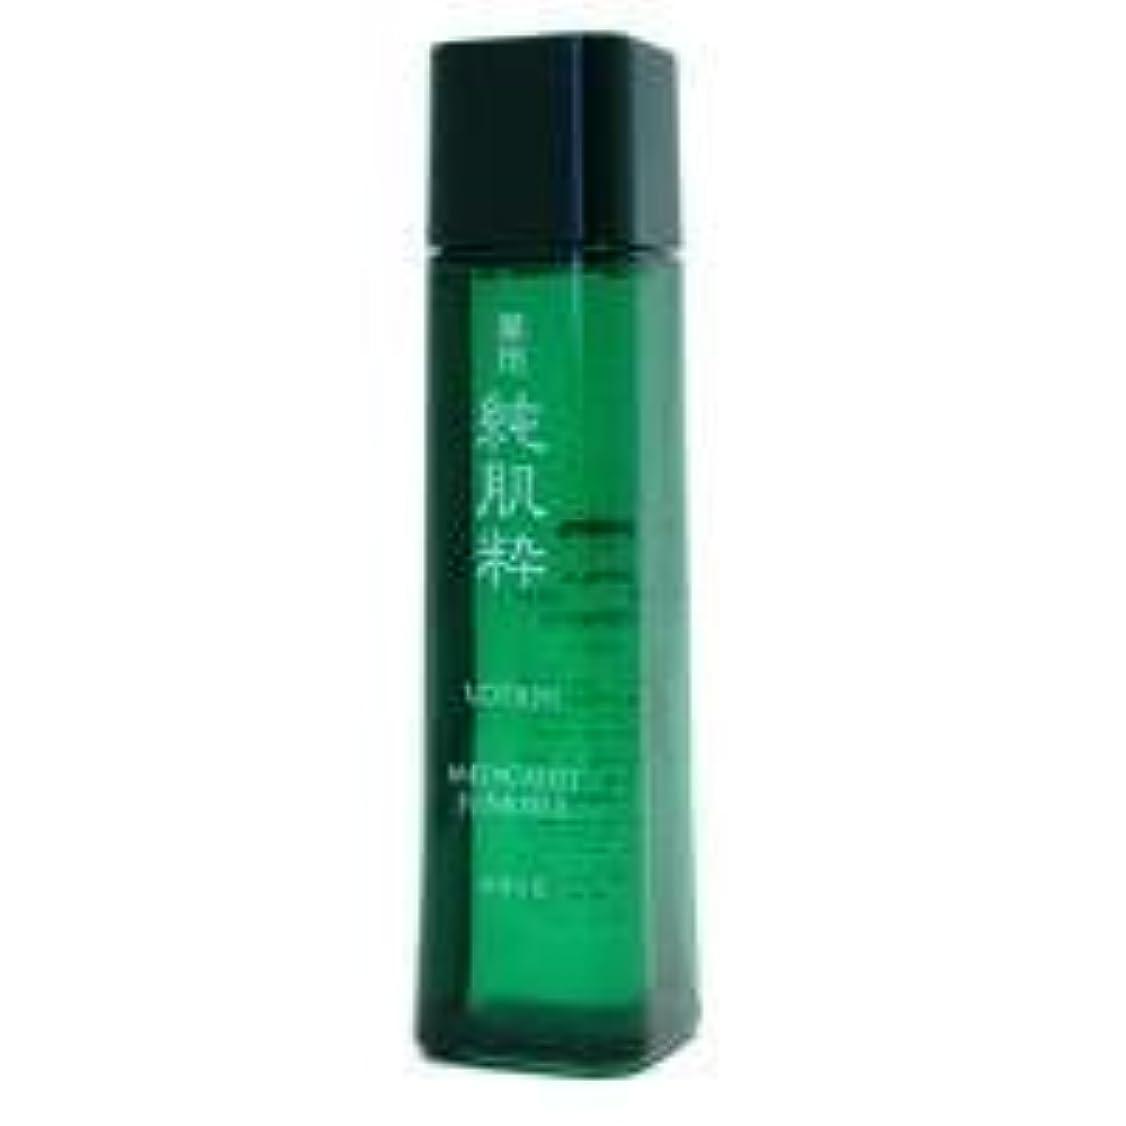 提案ベイビー生産性コーセー 薬用 純肌粋 化粧水 150ml